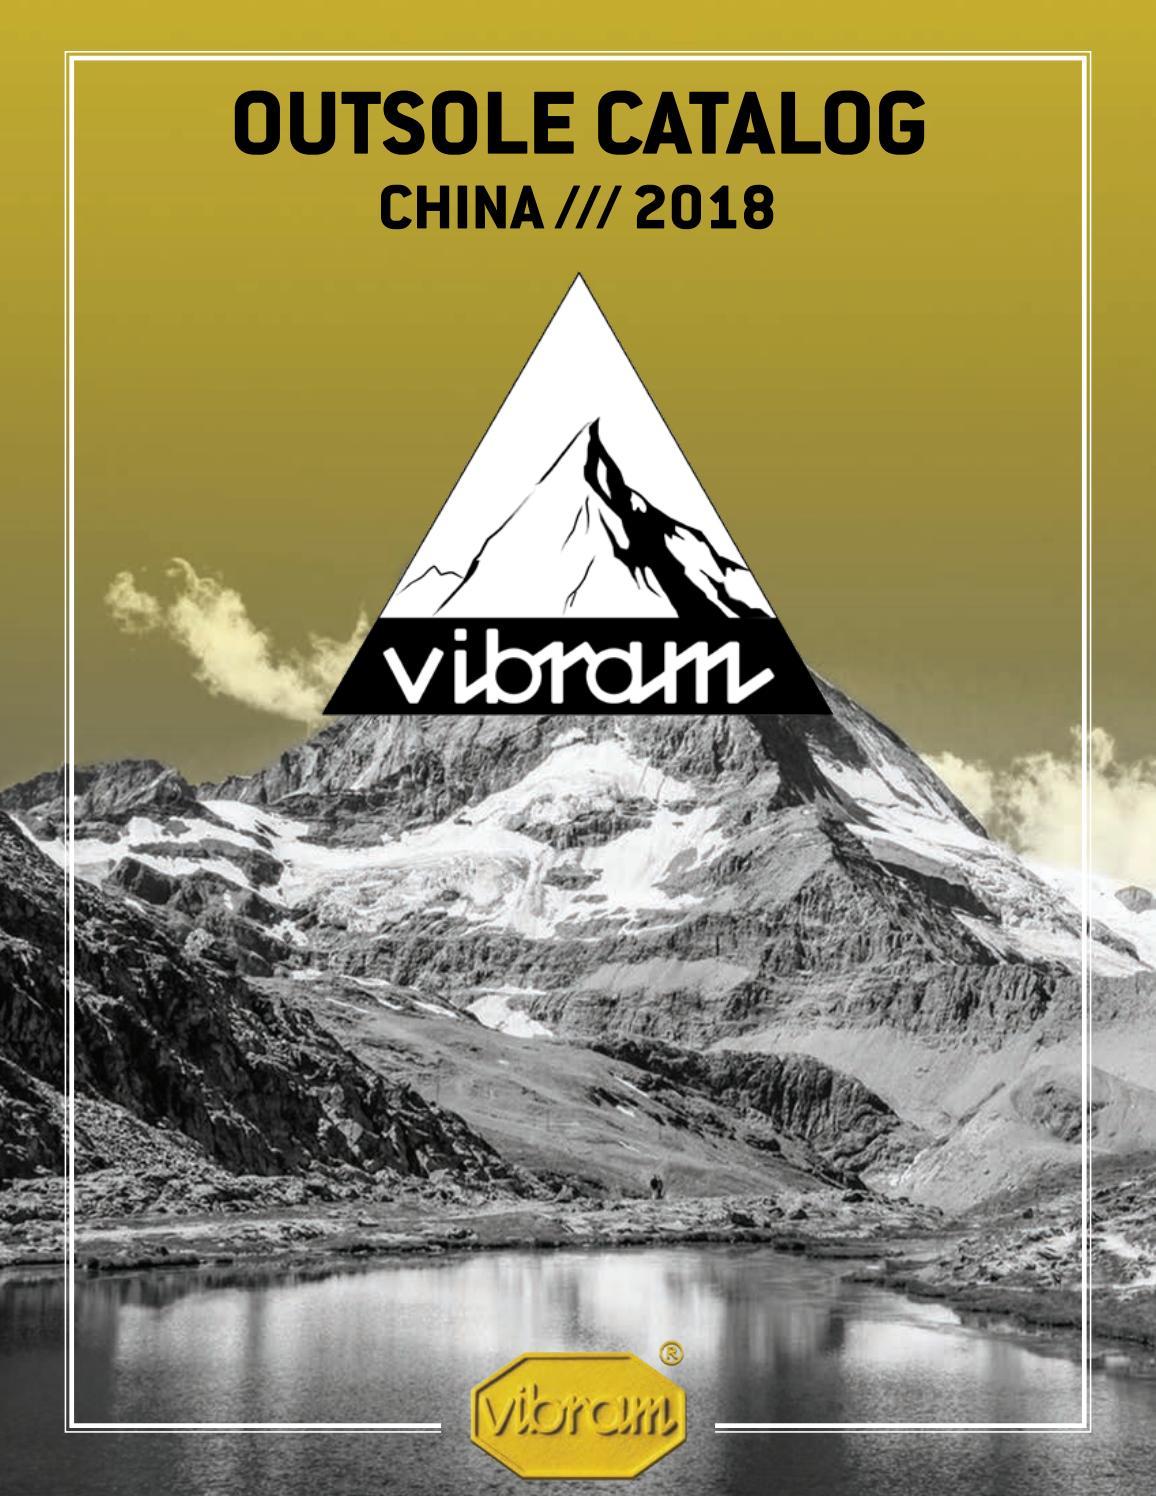 Vibram Outsole Catalog June 2018 by Vibram® issuu